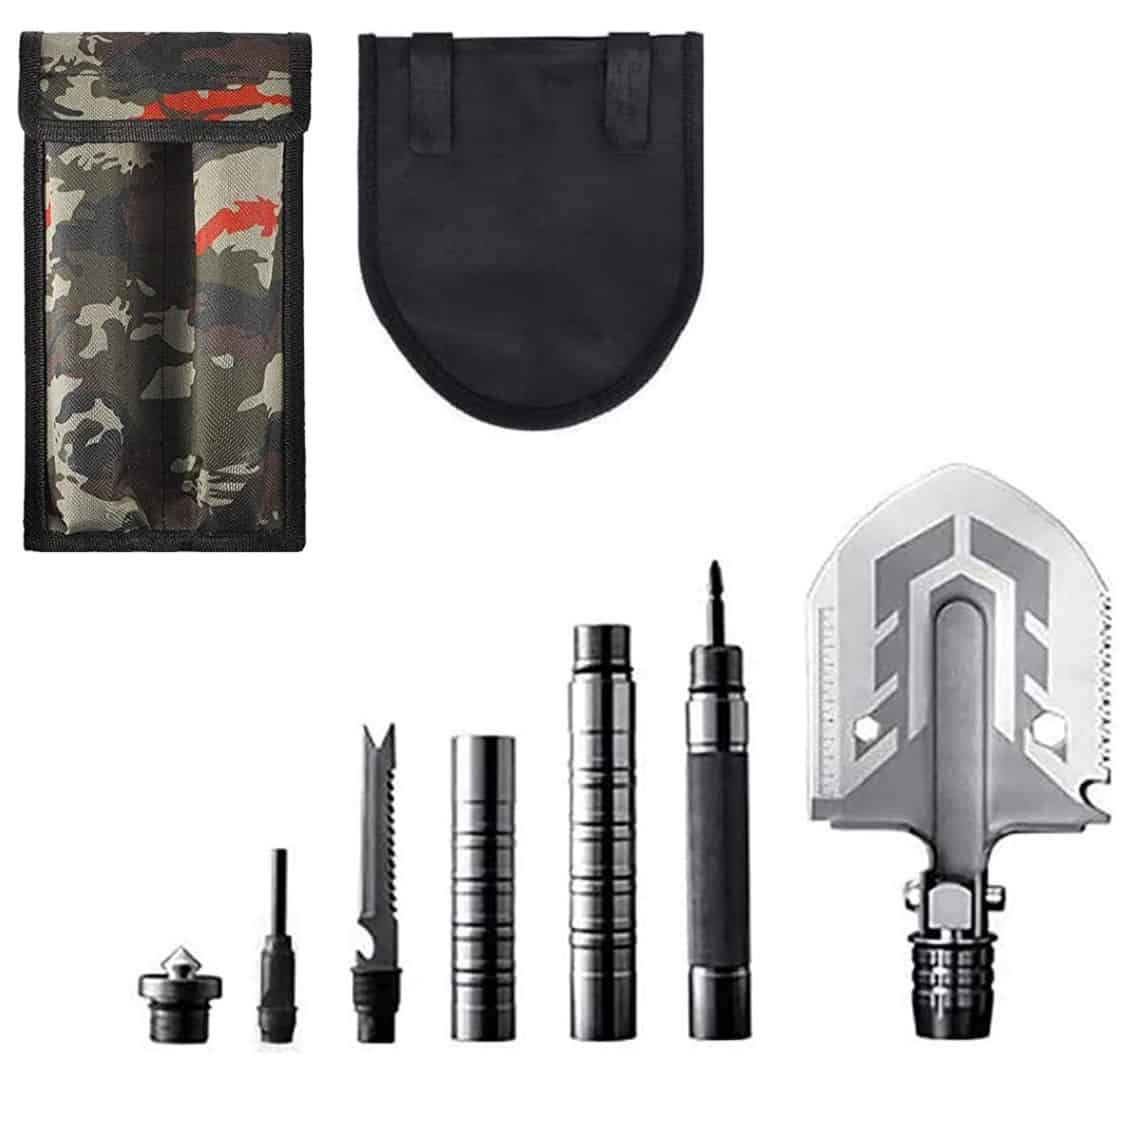 15-in-1 Tactical Survival Shovel, tactical shovel, best tactical shovel, survival shovel multi tool, camping shovel multi tool